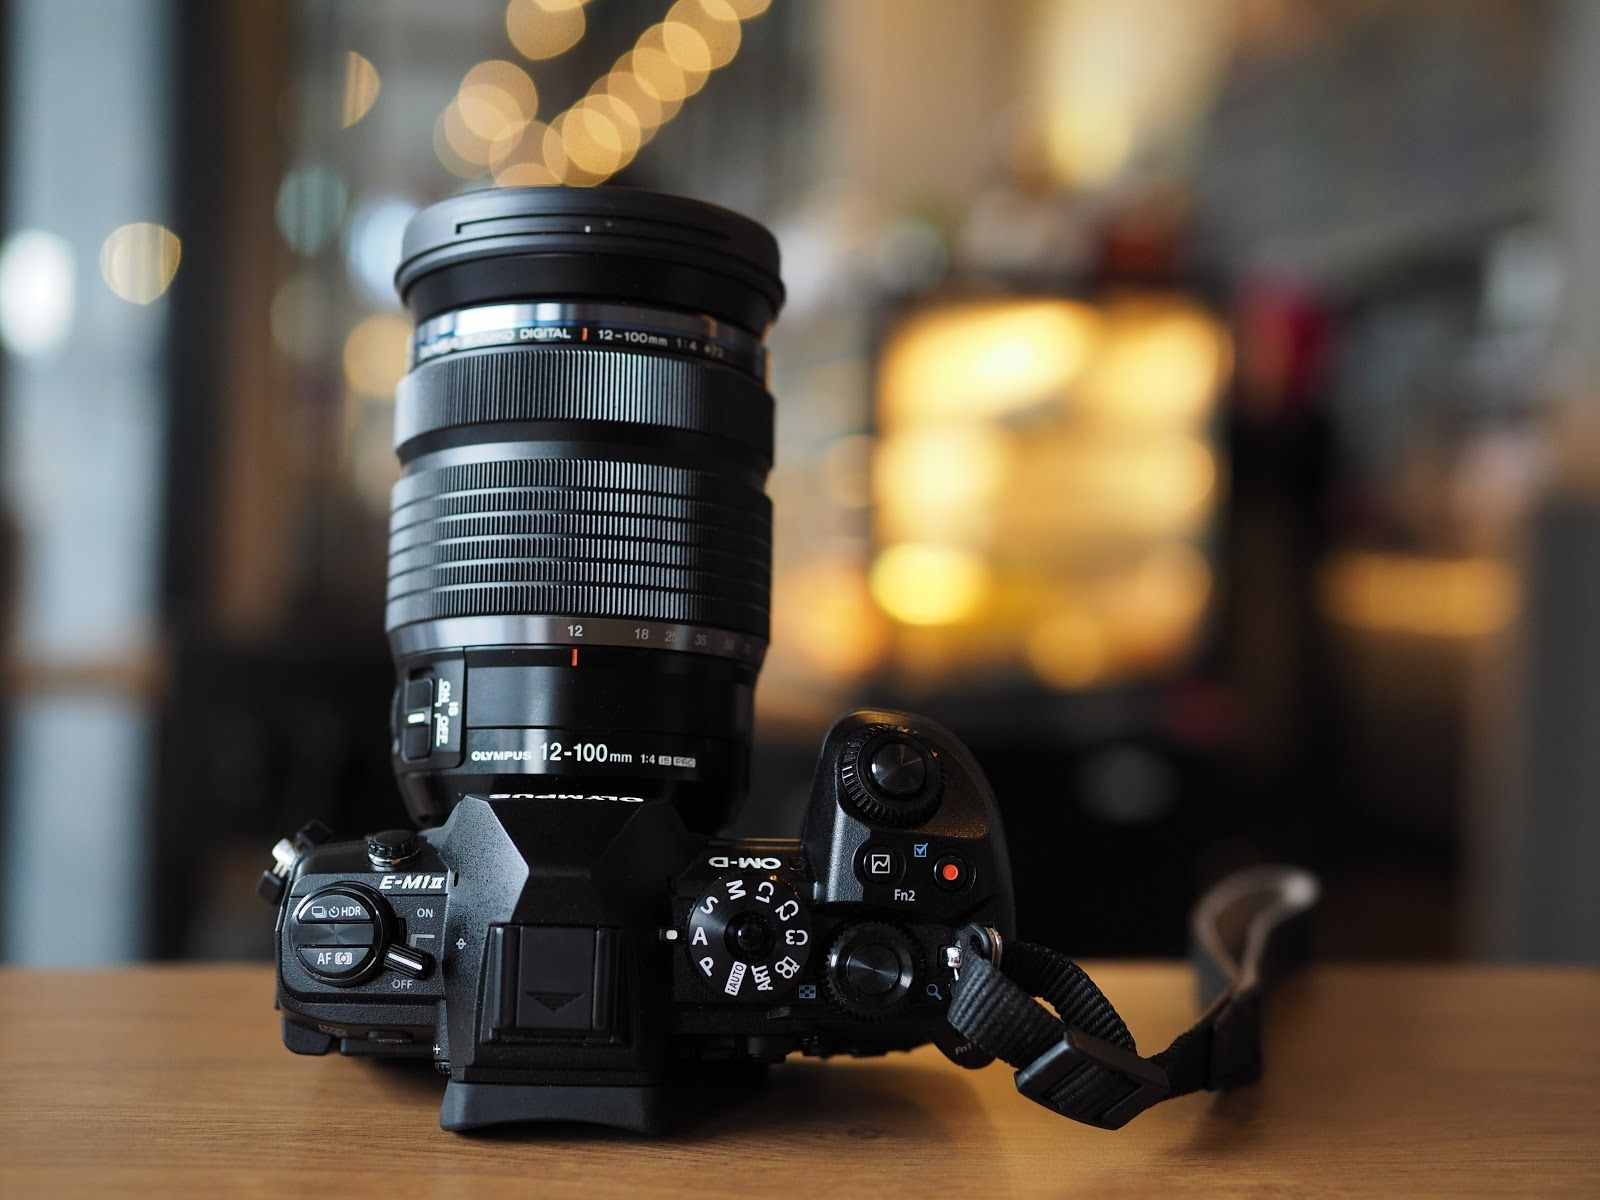 Review The Olympus Zuiko Digital Zd 12 100 4 Pro Ming Thein Digital Olympus Photo Gear